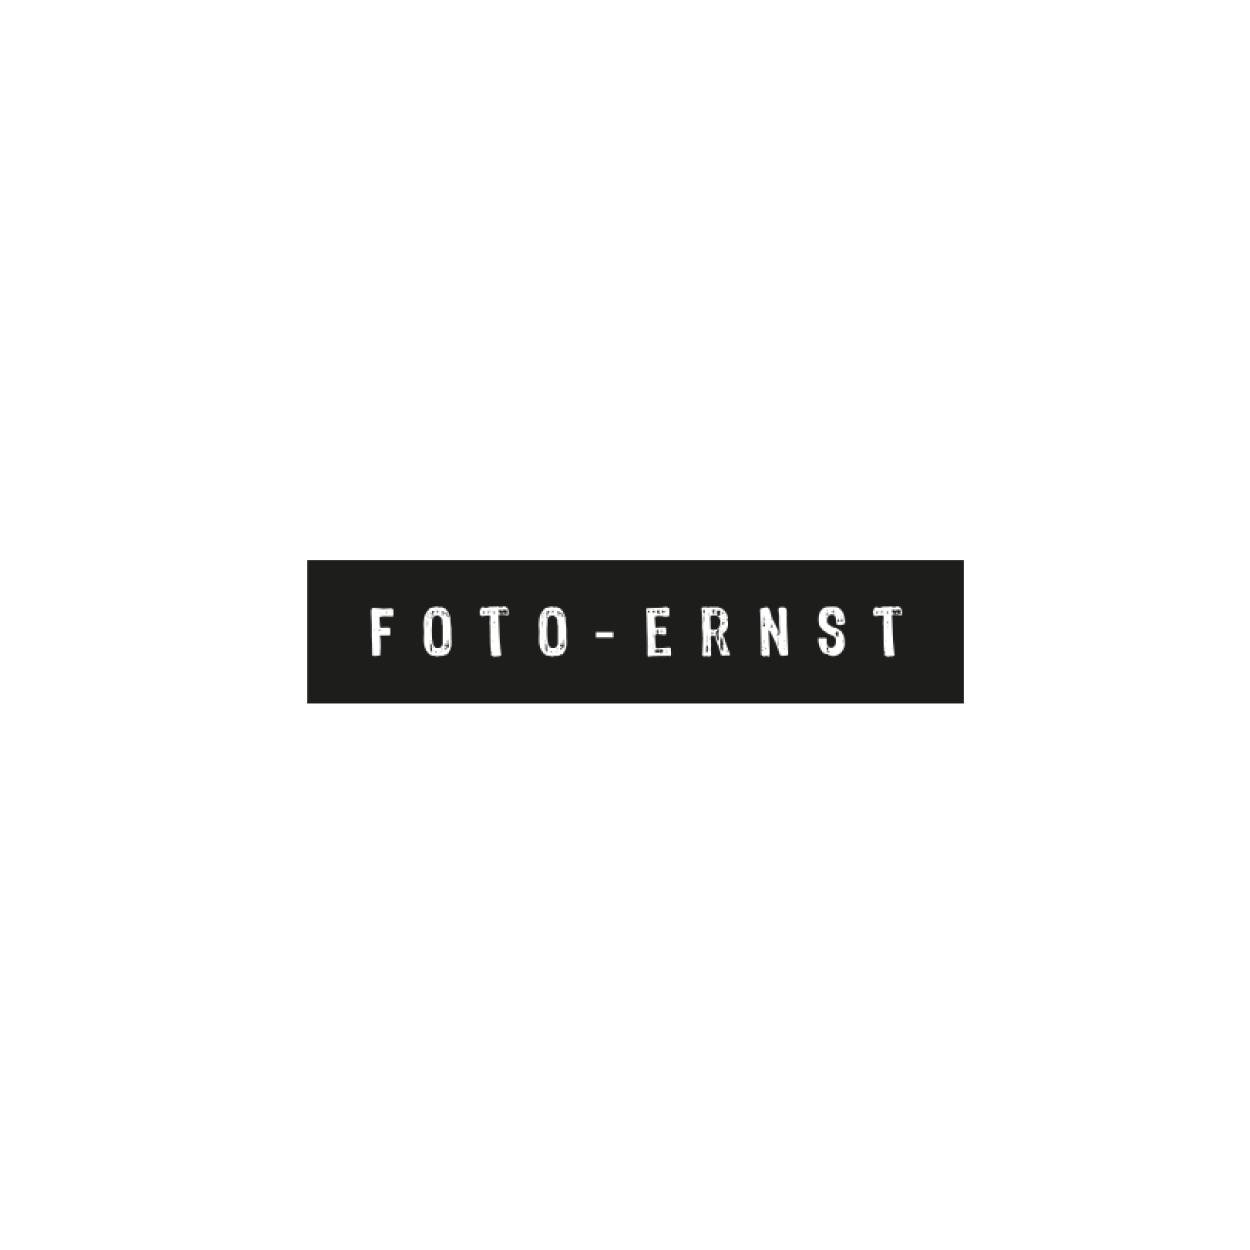 thumb_Foto_Ernst.jpg